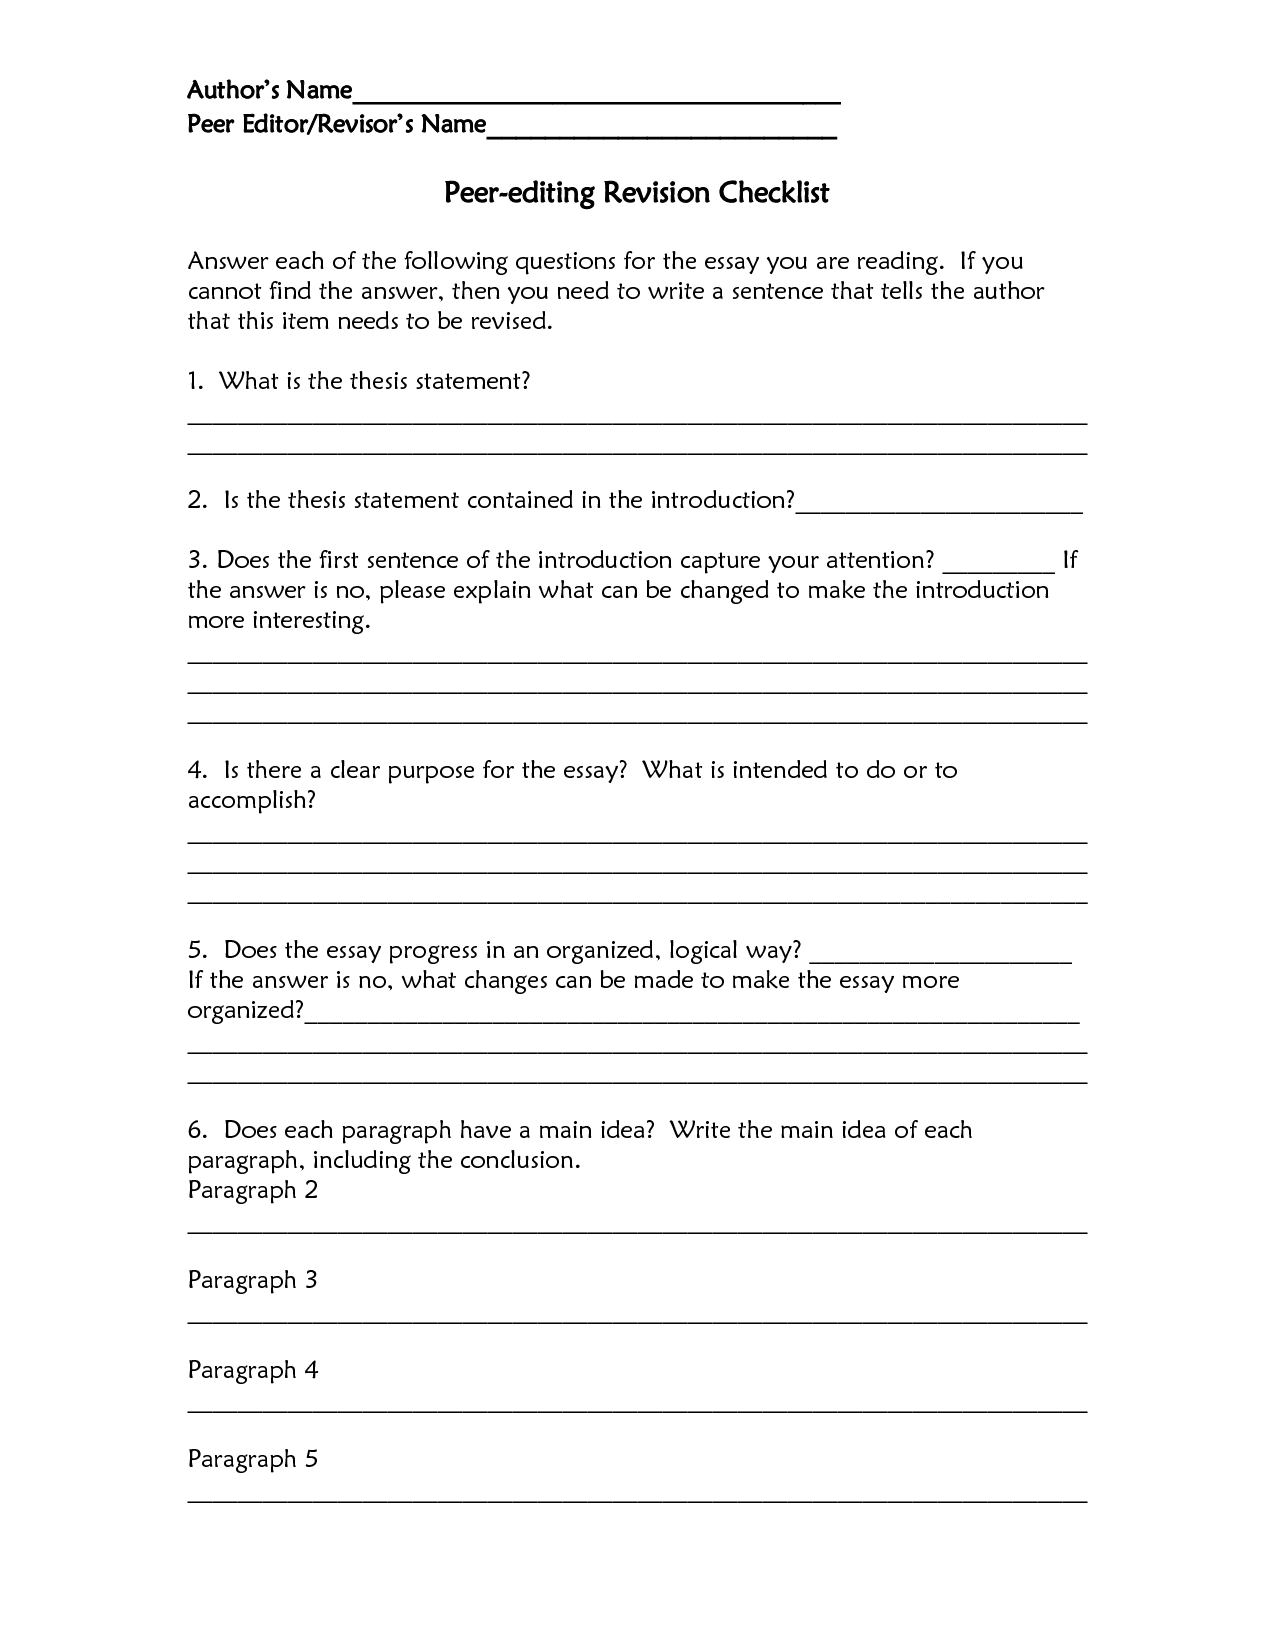 Peer Review Resume Checklist – Revising and Editing Worksheets